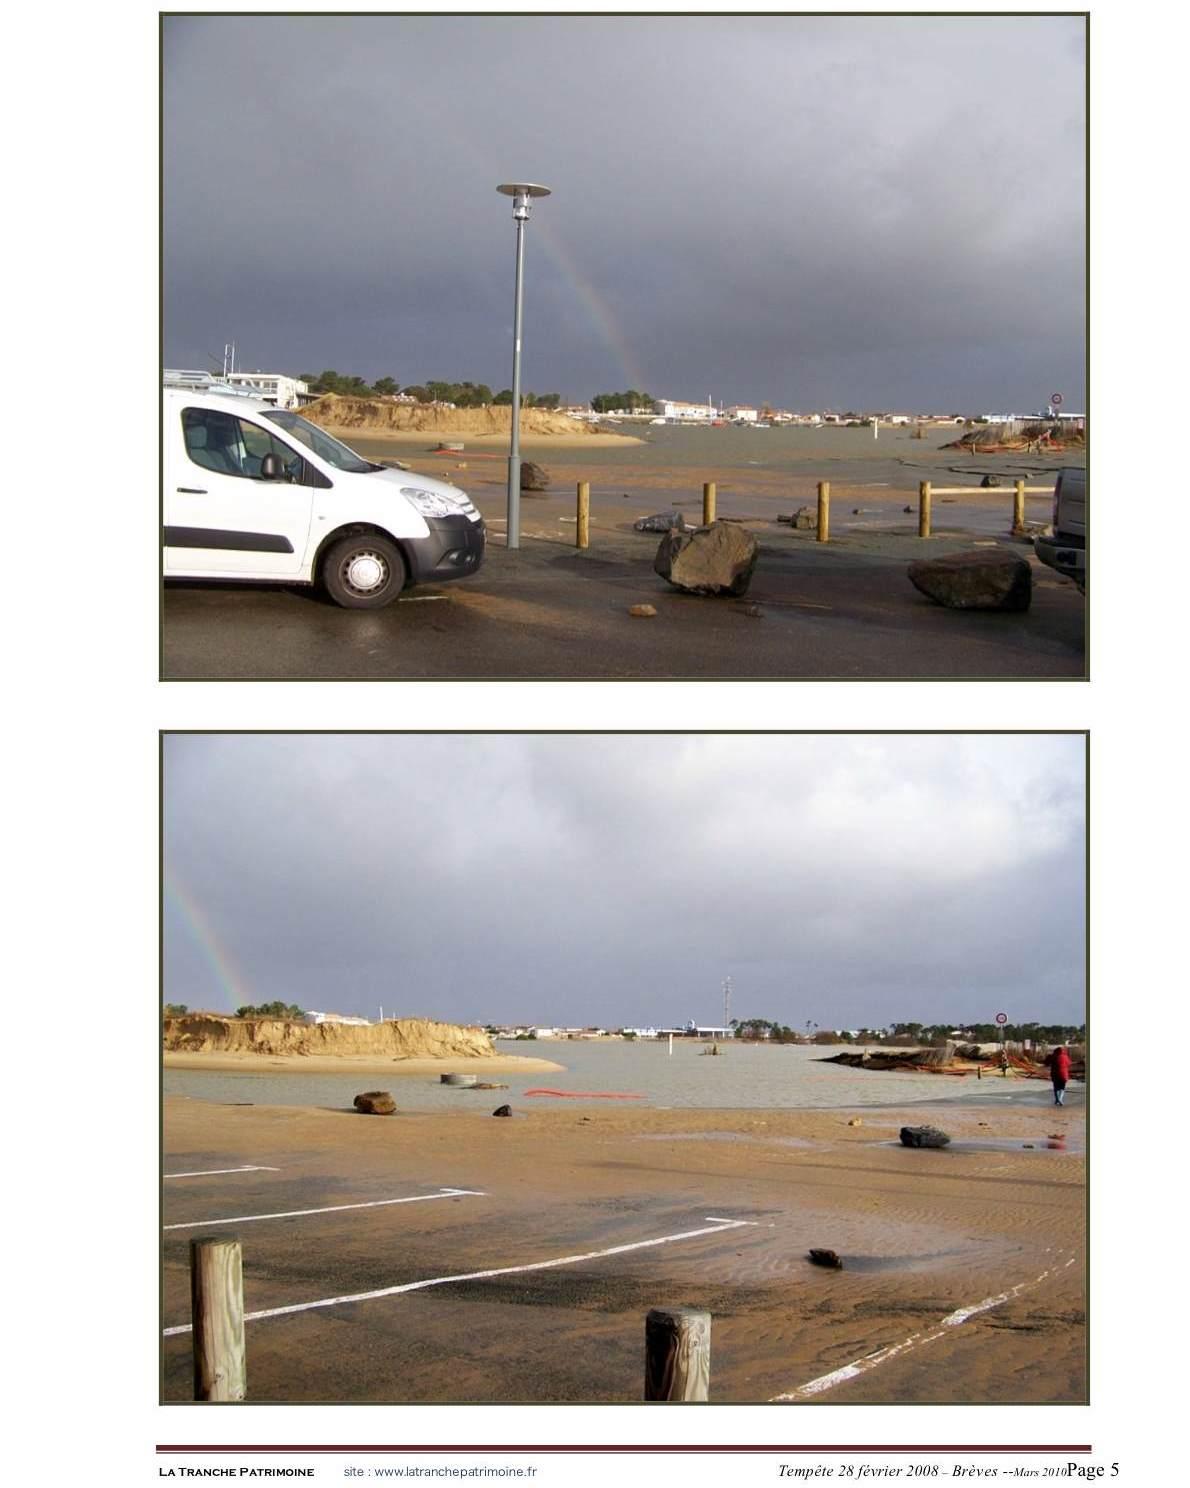 Tempête 28 2 2010 JPEG5 R.jpg